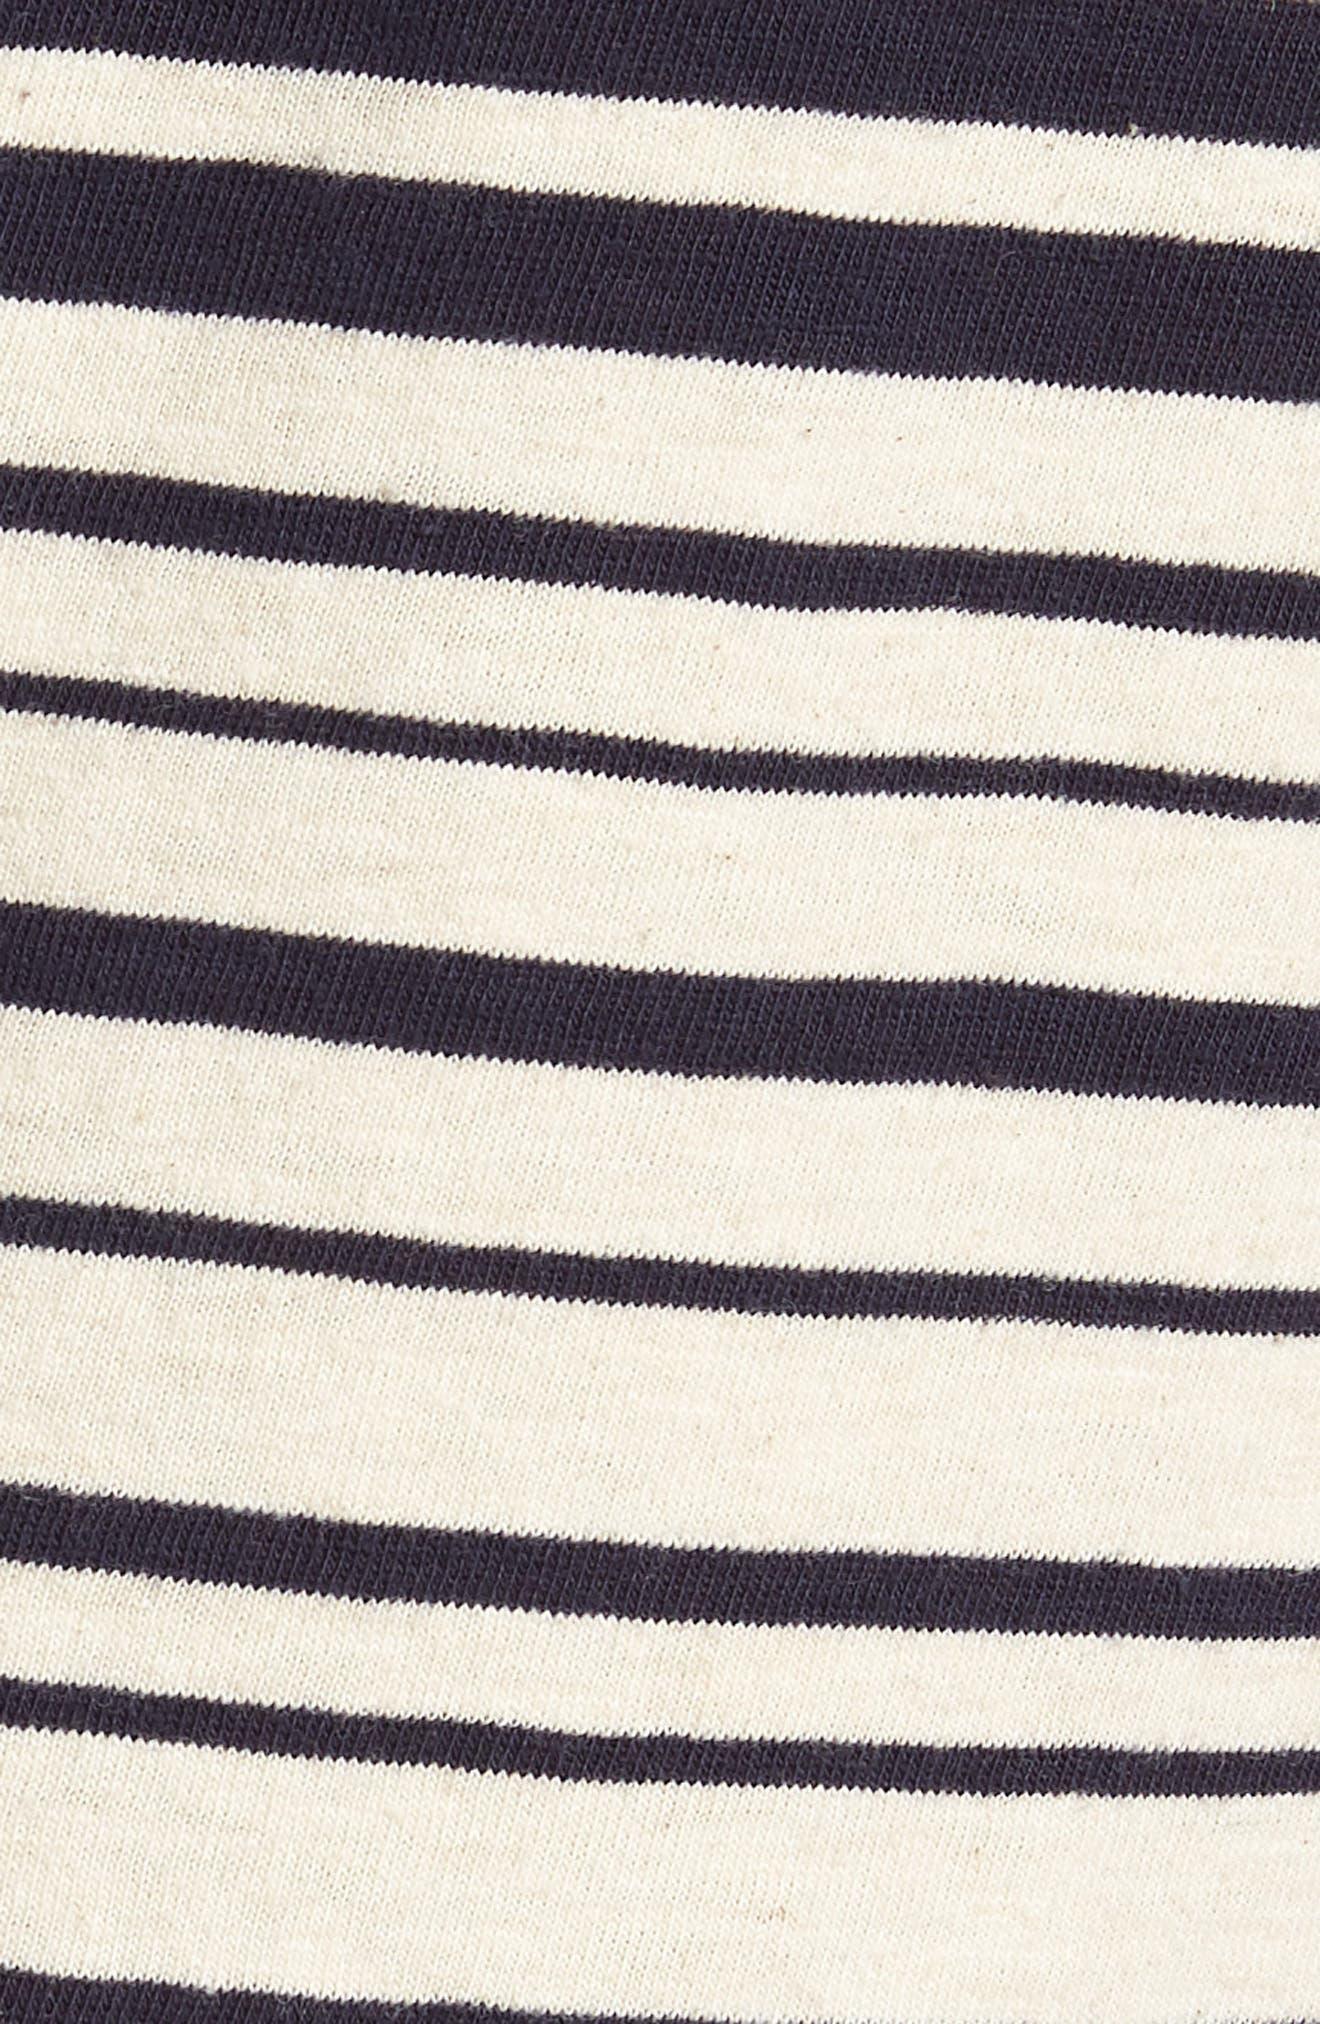 Variegated Stripe Slub Cotton T-Shirt,                             Alternate thumbnail 3, color,                             Ivory Navy